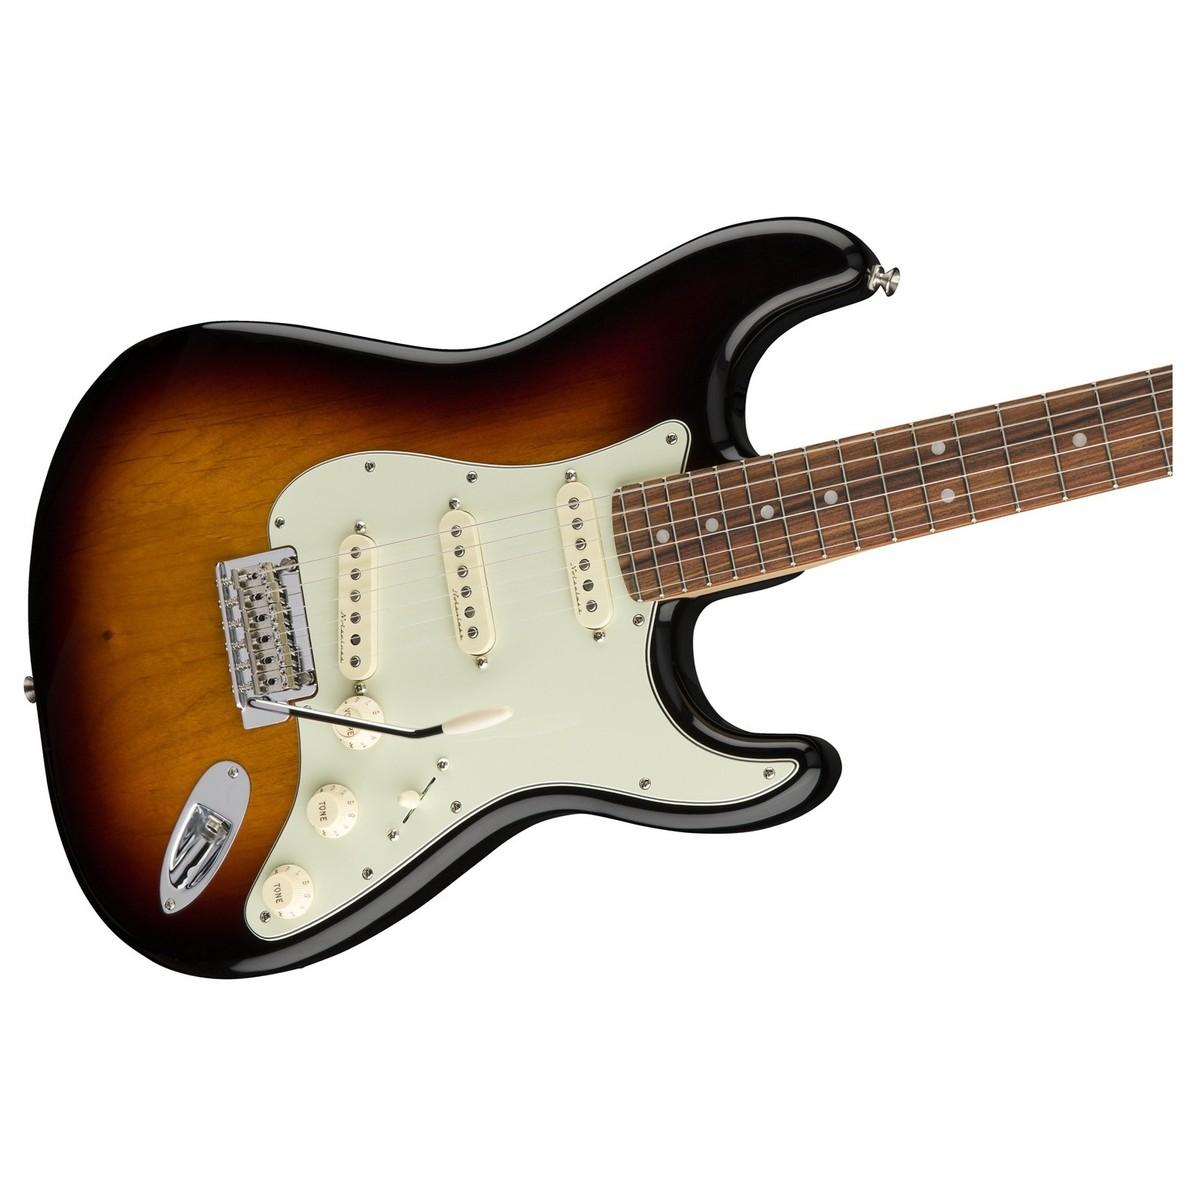 Fender       Deluxe       Roadhouse    Stratocaster  Pau Ferro  3 Tone